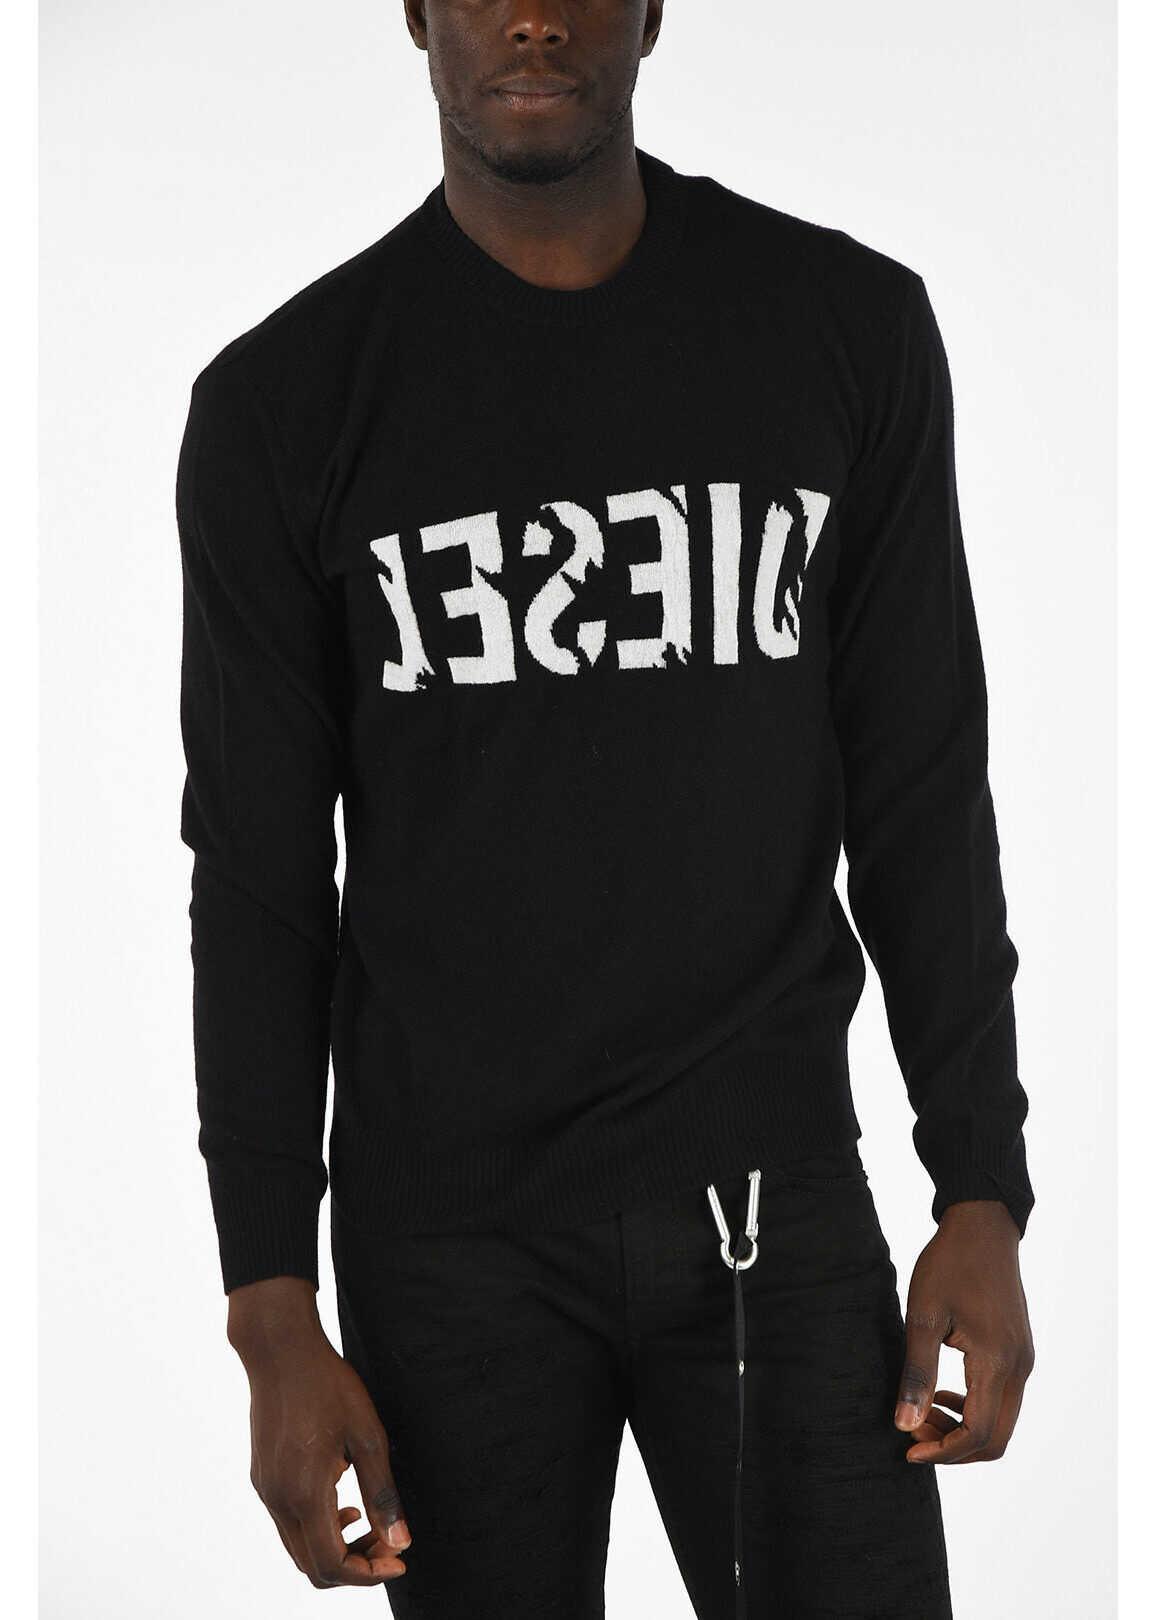 Diesel Wool and Cashmere K-JOY Sweater BLACK imagine